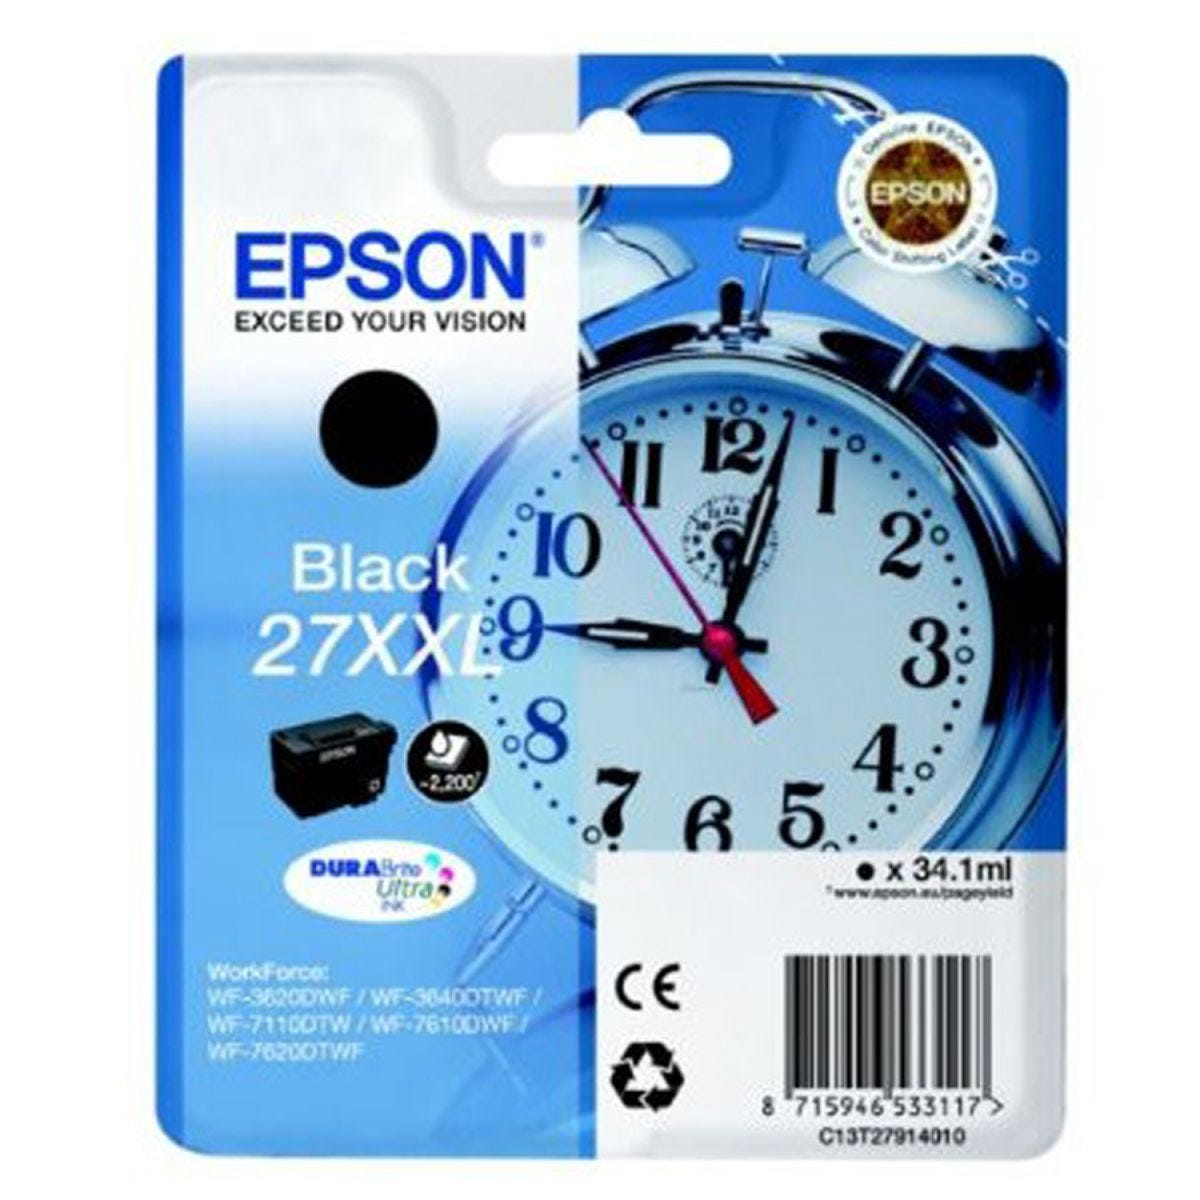 Epson Alarm Clock Ink Cartridge T2791XXL – Black